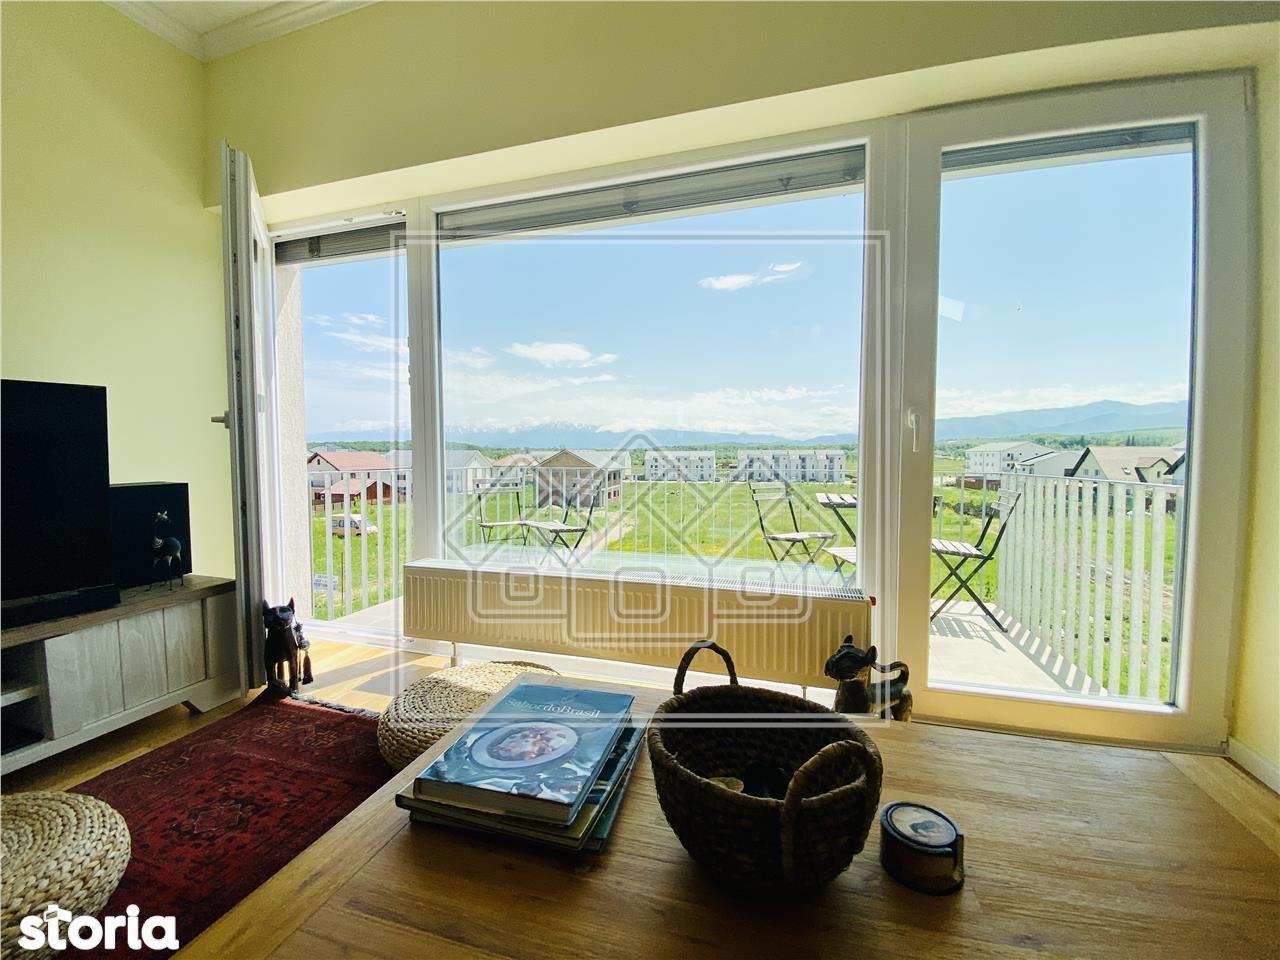 Apartament 3 camere - mobilat si utilat modern, cu terasa